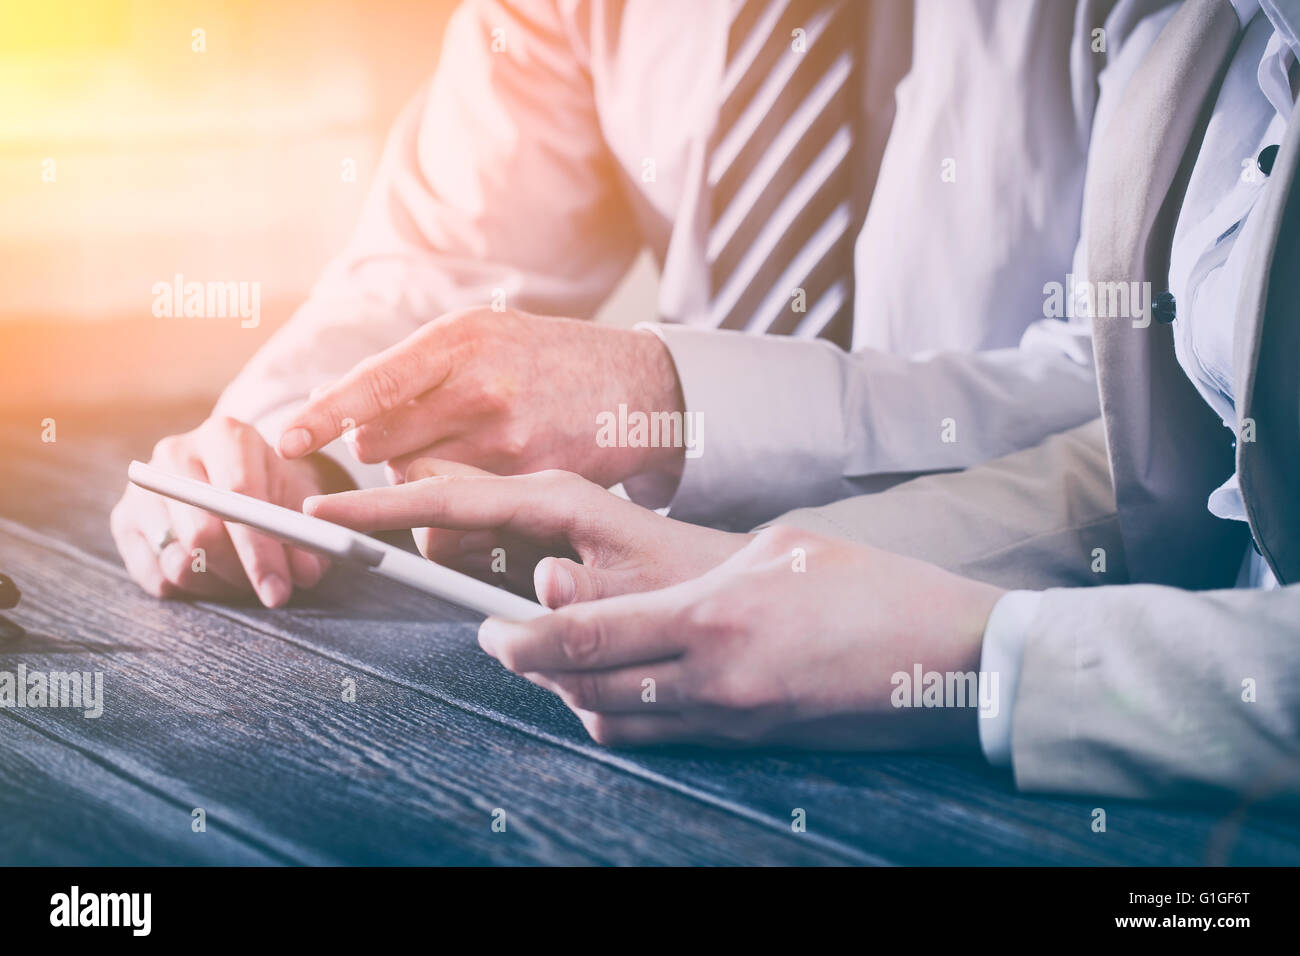 Business-Meeting executive consulting Karriere Bericht Tablet - stock Bild überprüfen Stockbild